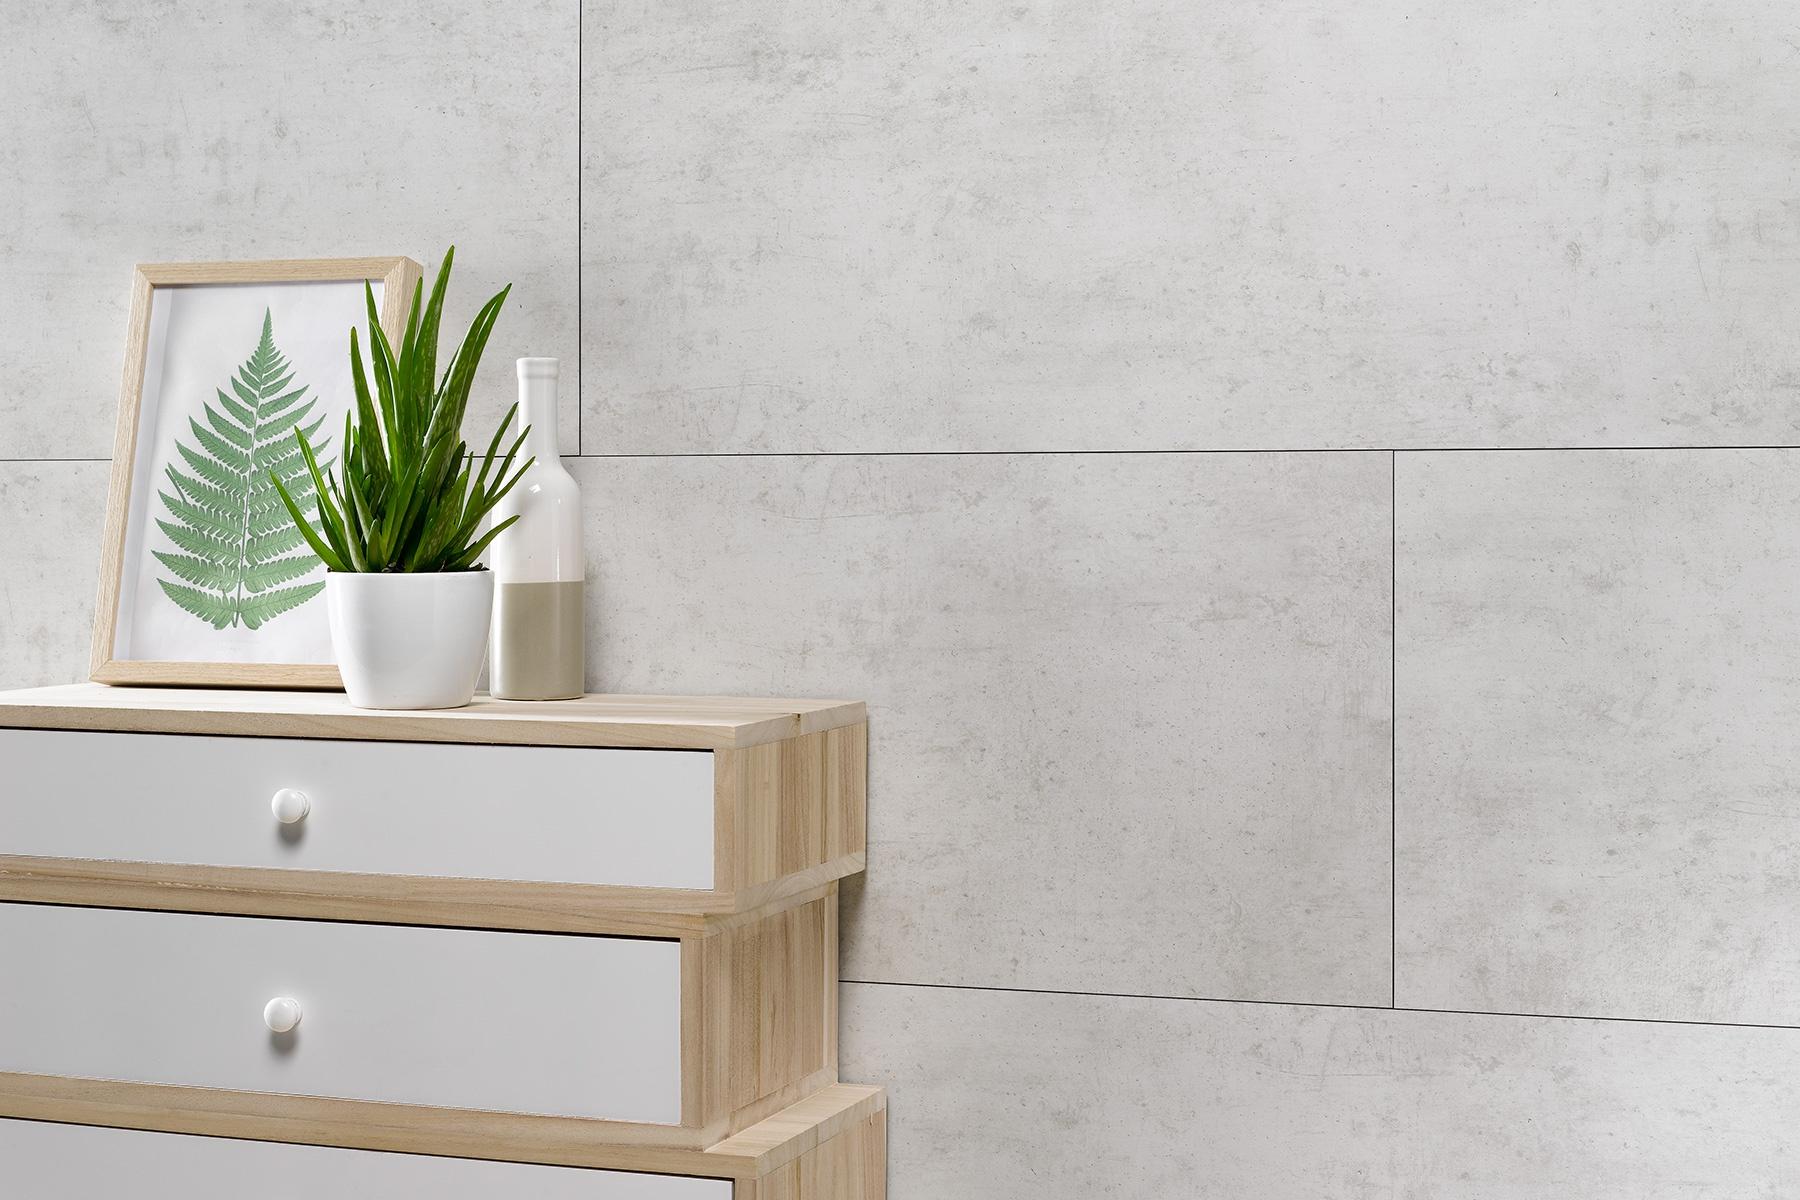 Dumawall Salle De Bain waterproof pvc tongue-and-groove wall cladding | dumawall+